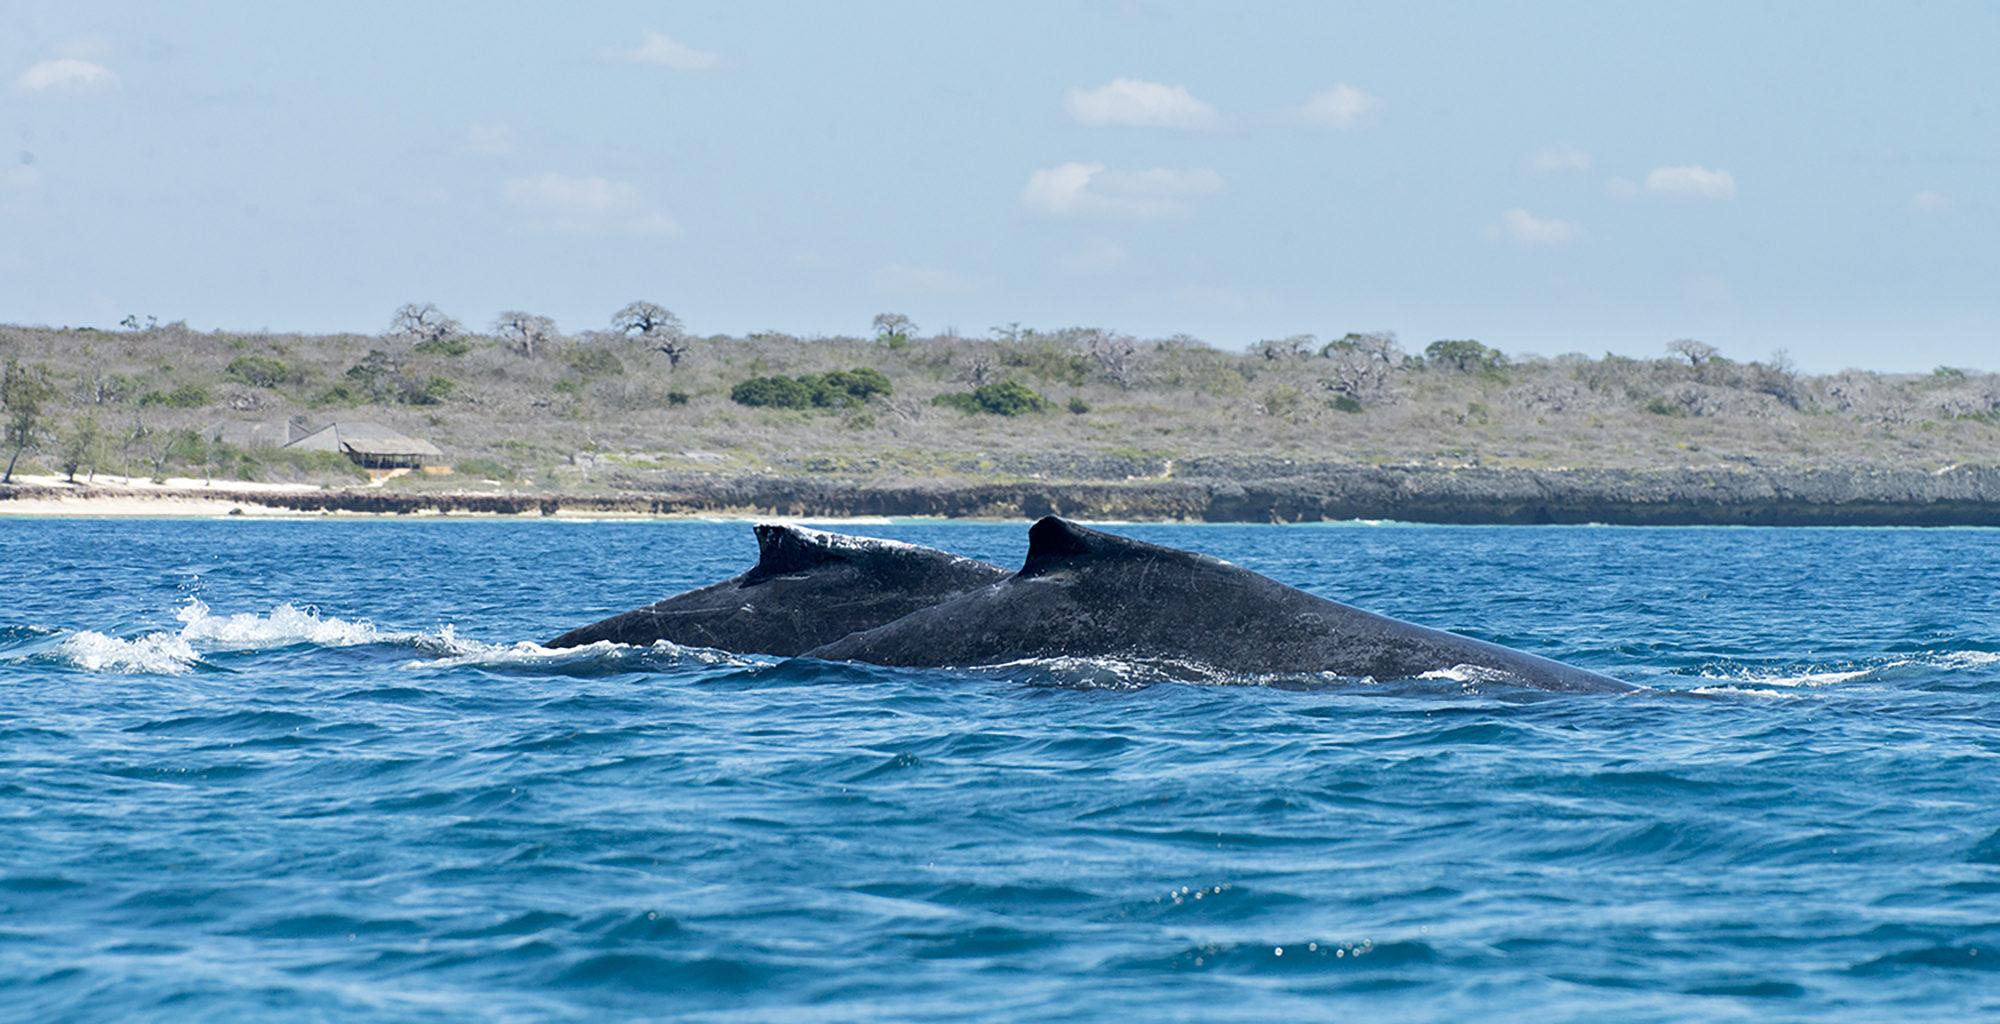 Illha-de-Mozambique-Nampula-Sealife-Humpback-Whale